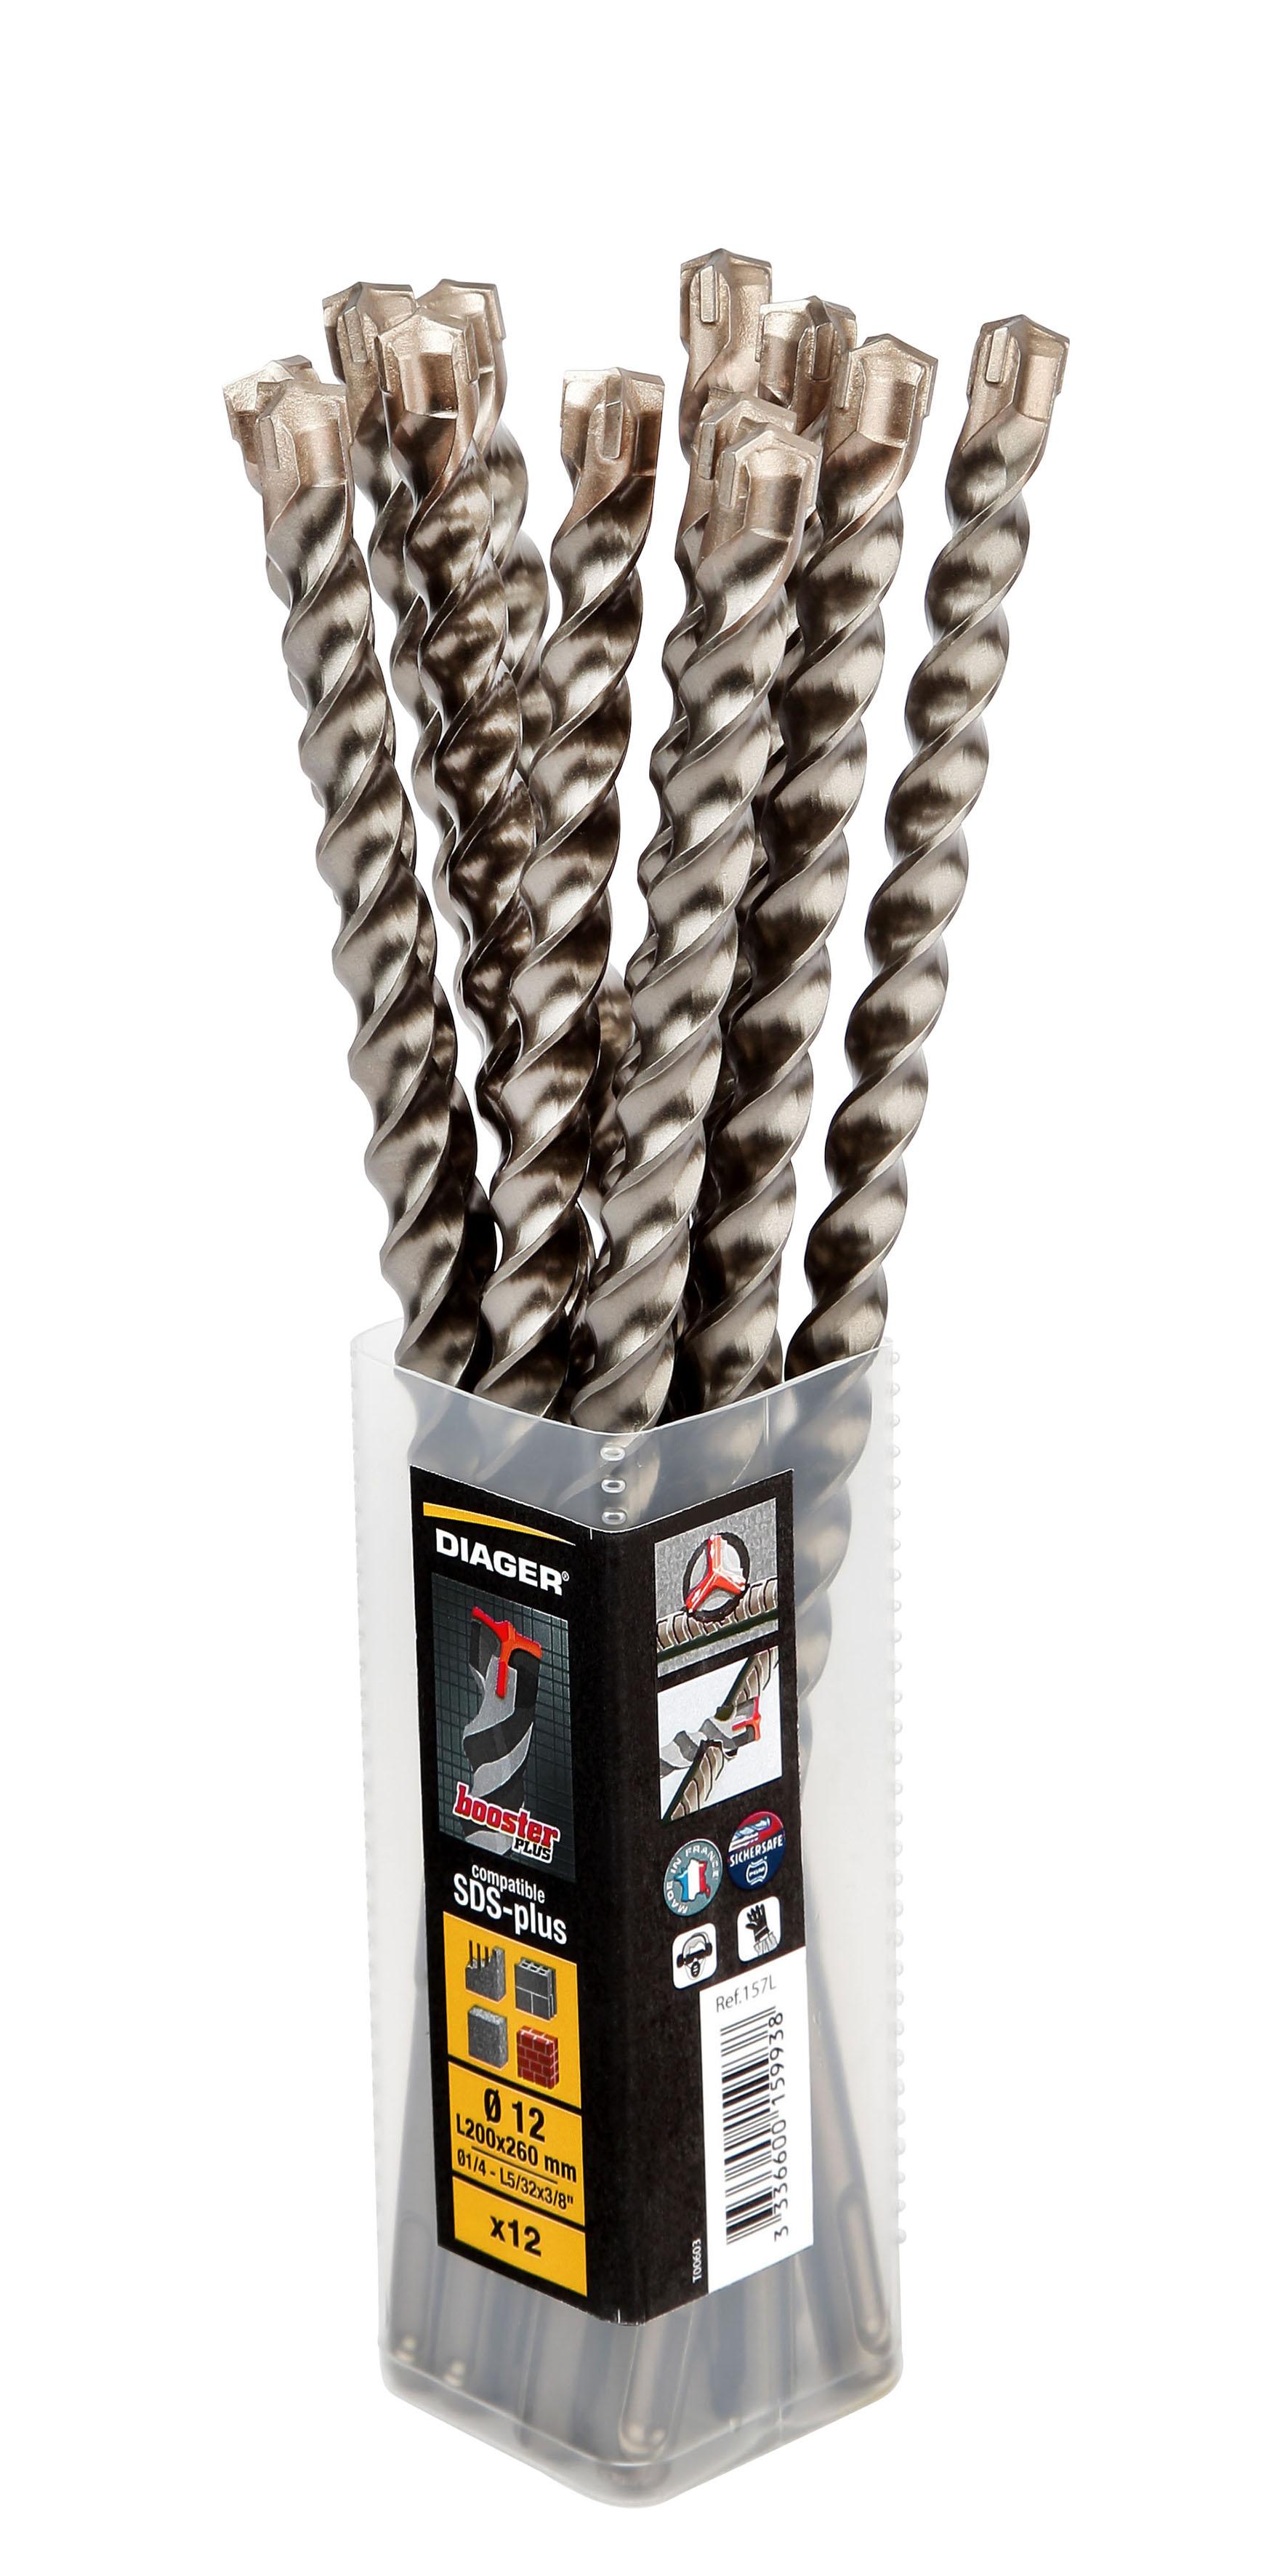 Drilling Booster Plus Hammer drill bit 3 cutting edges compatible SDS+ pack 12 pcs - 157L.jpg